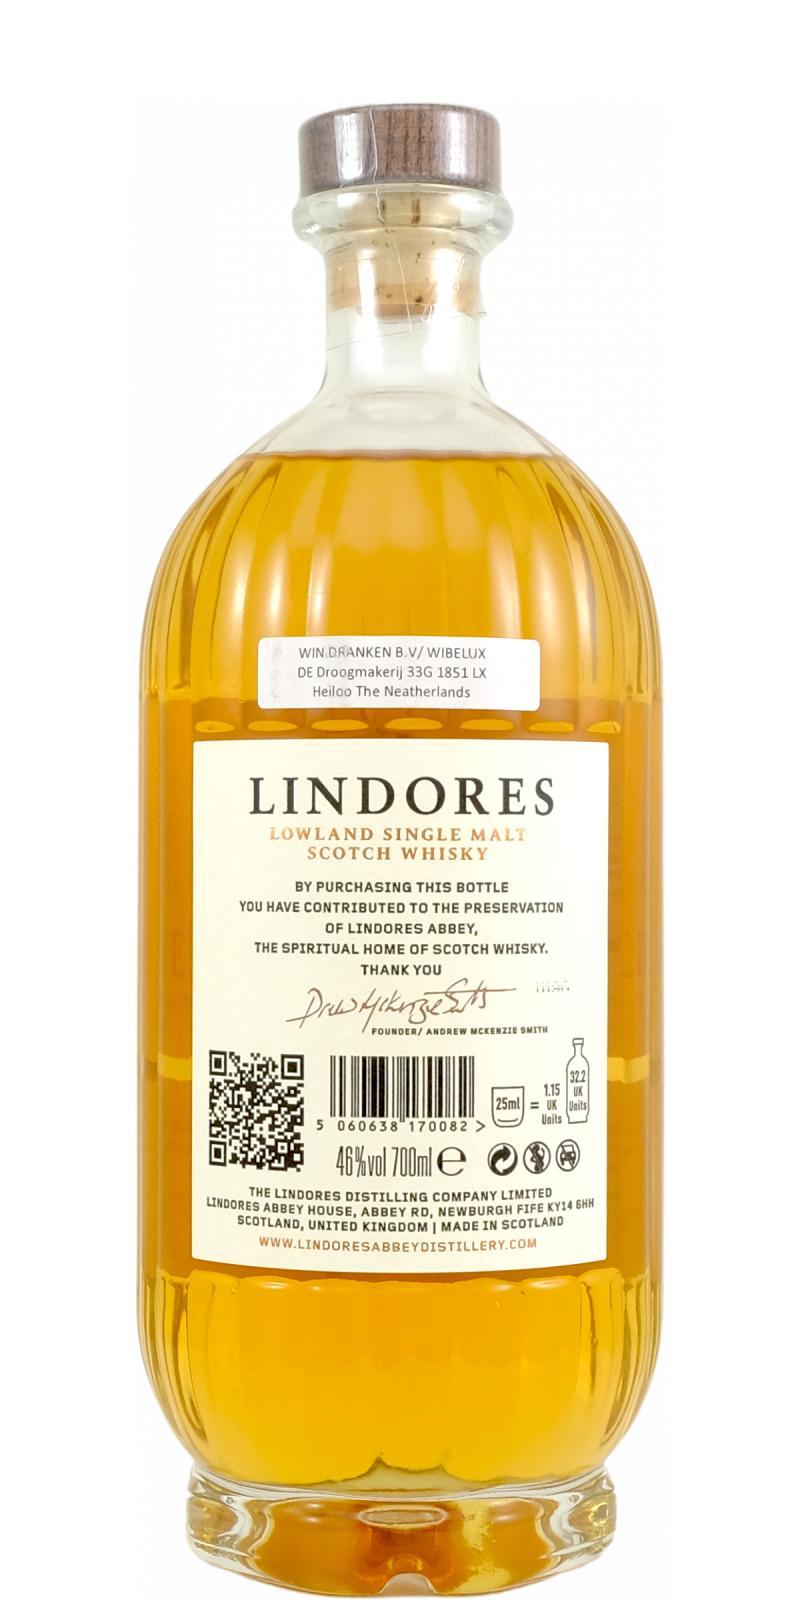 Lindores Abbey Single Malt Scotch Whisky MCDXCIV